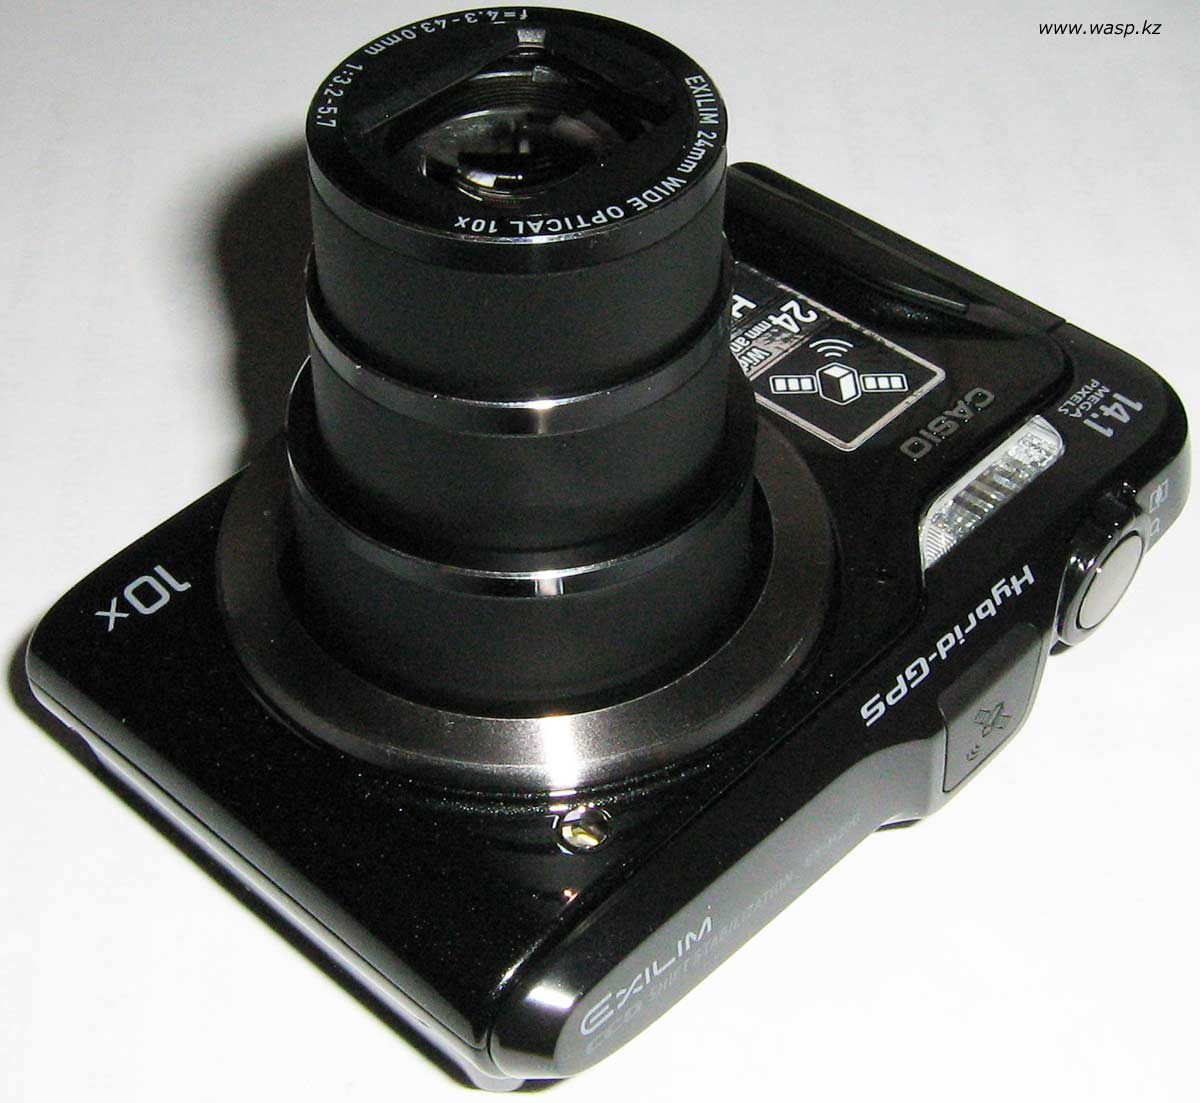 Casio EX-H20G Exilim полный 10 кратный зум